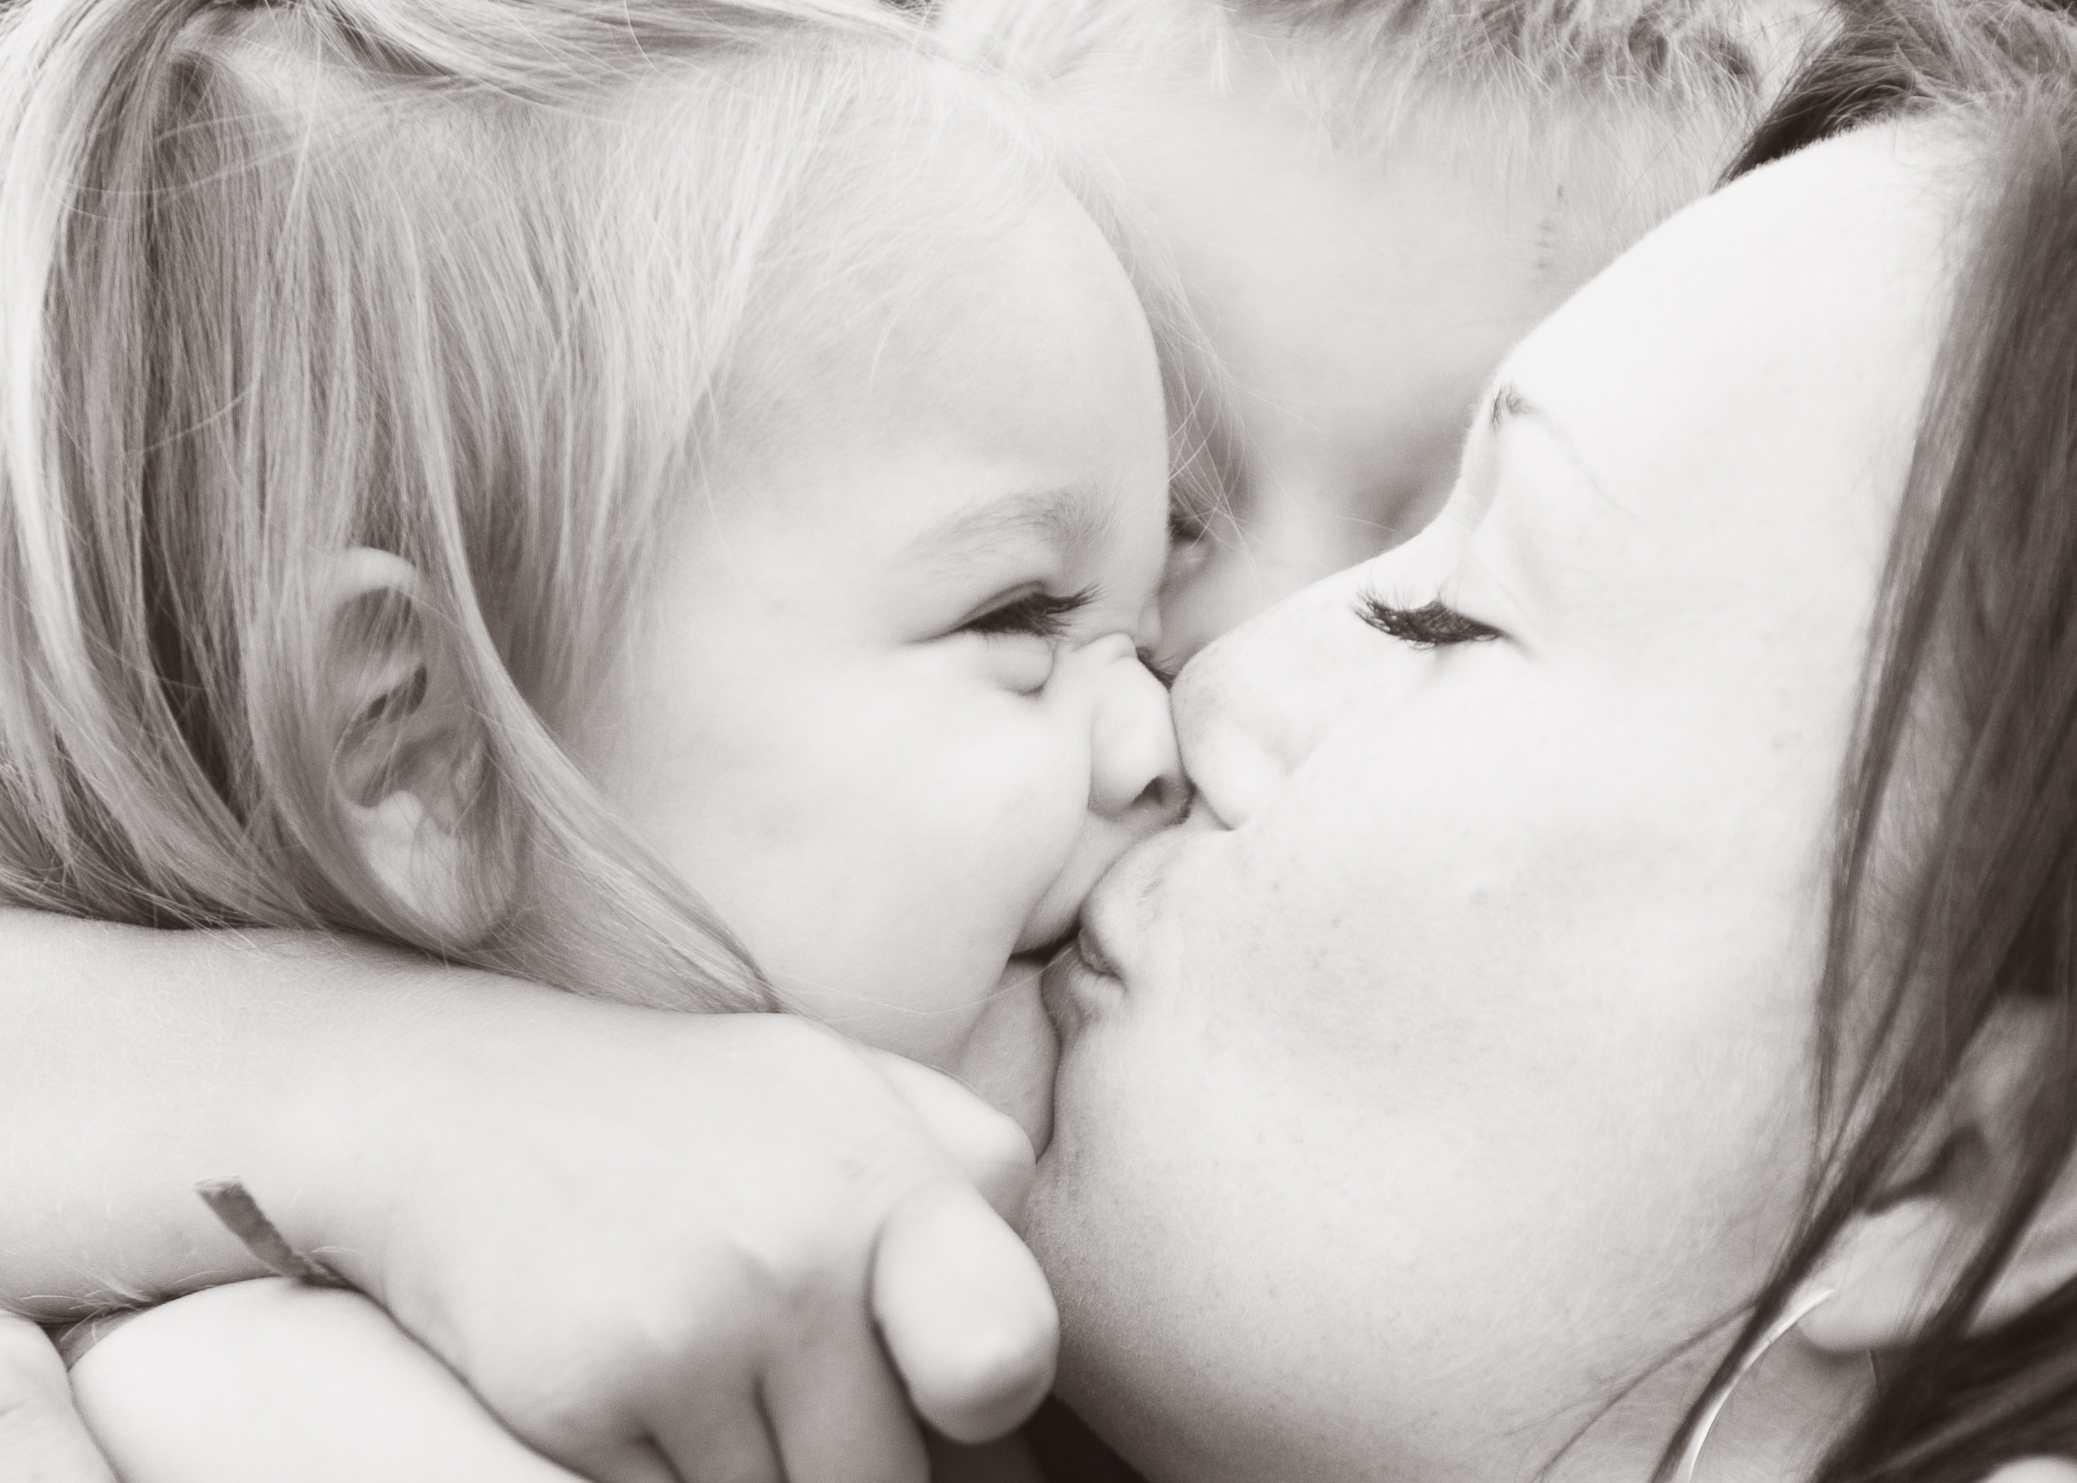 seattle-family-portrait-photographer-13.jpg